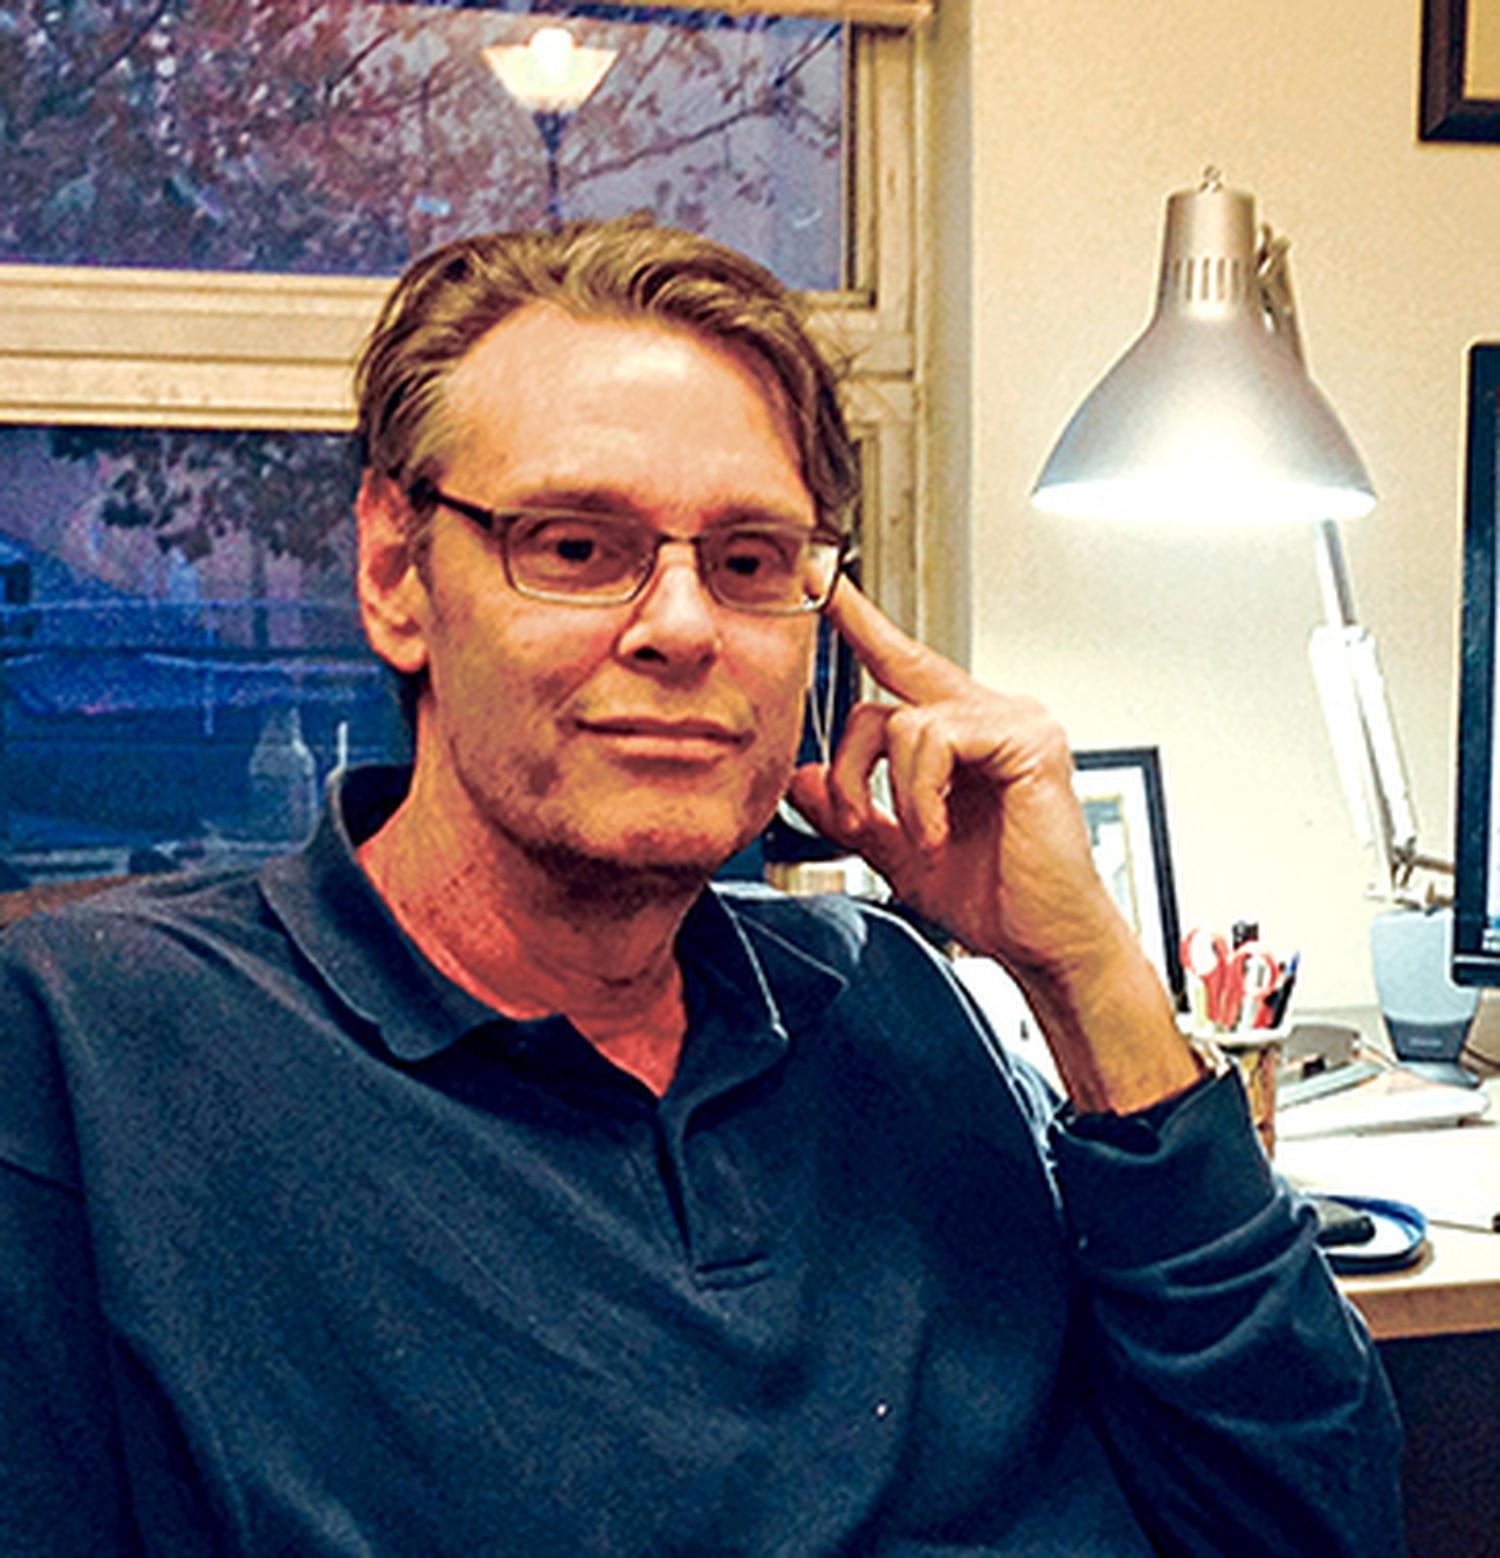 University of New Mexico's Jeff Mitchell says New Mexico's economy still has a long way to go.